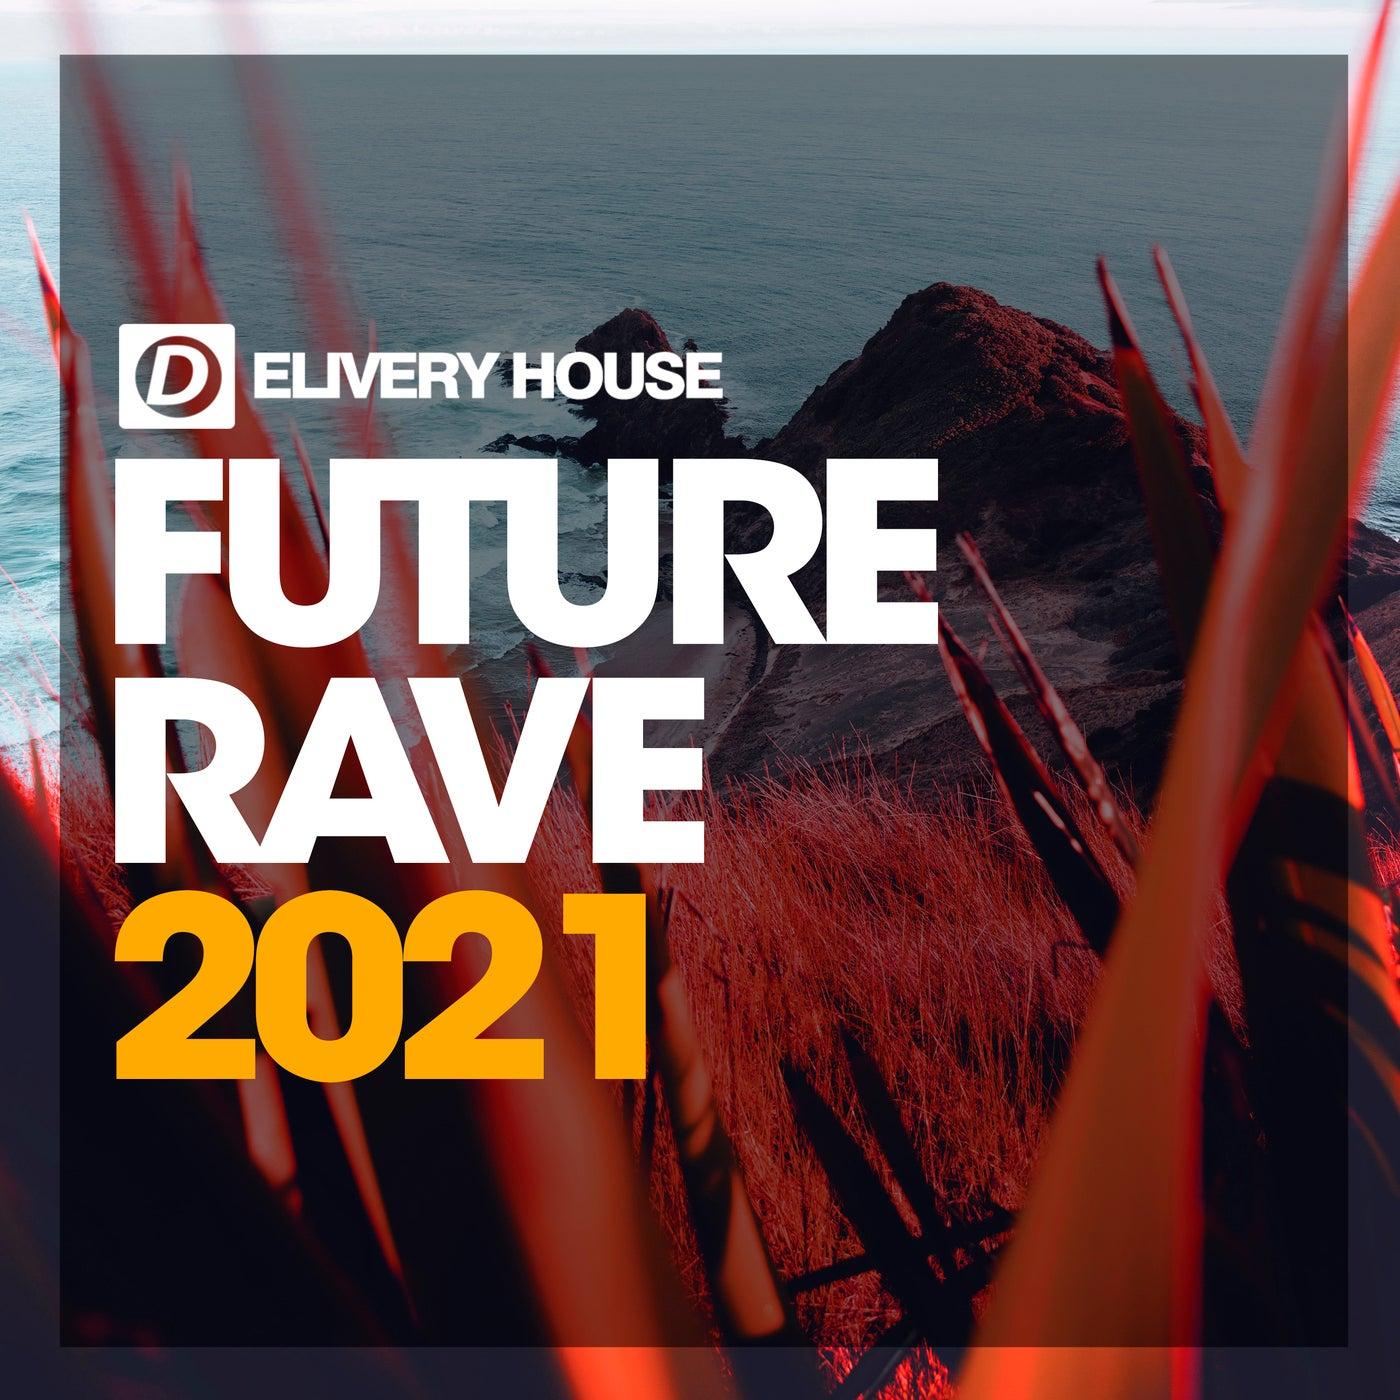 Future Rave 2021